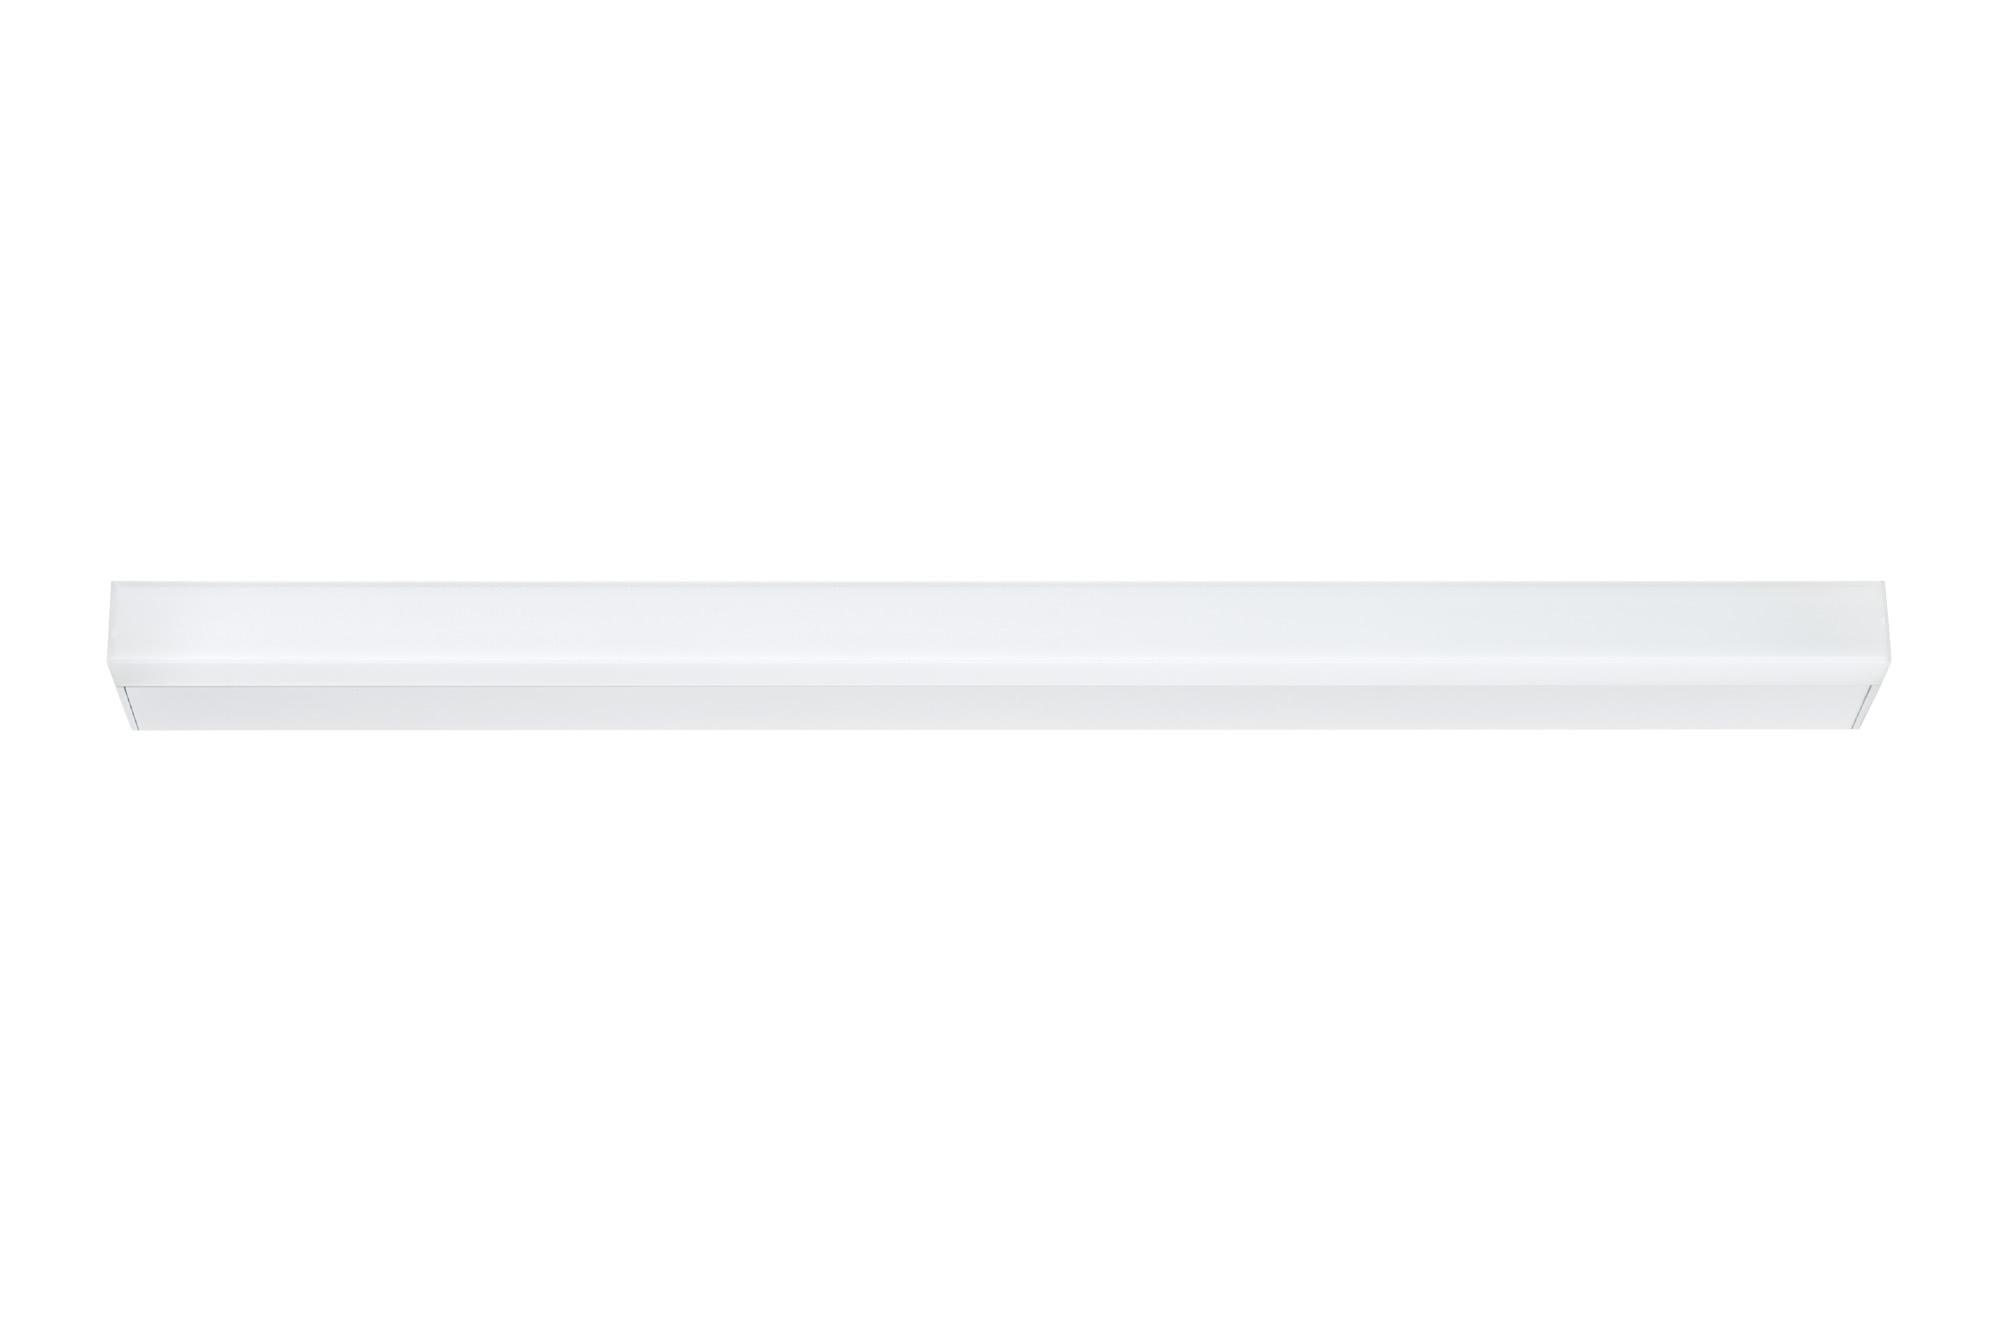 Paulmann. 70423 Светильник настенно-потолочный Linea 60 IP44 11W LED, белый